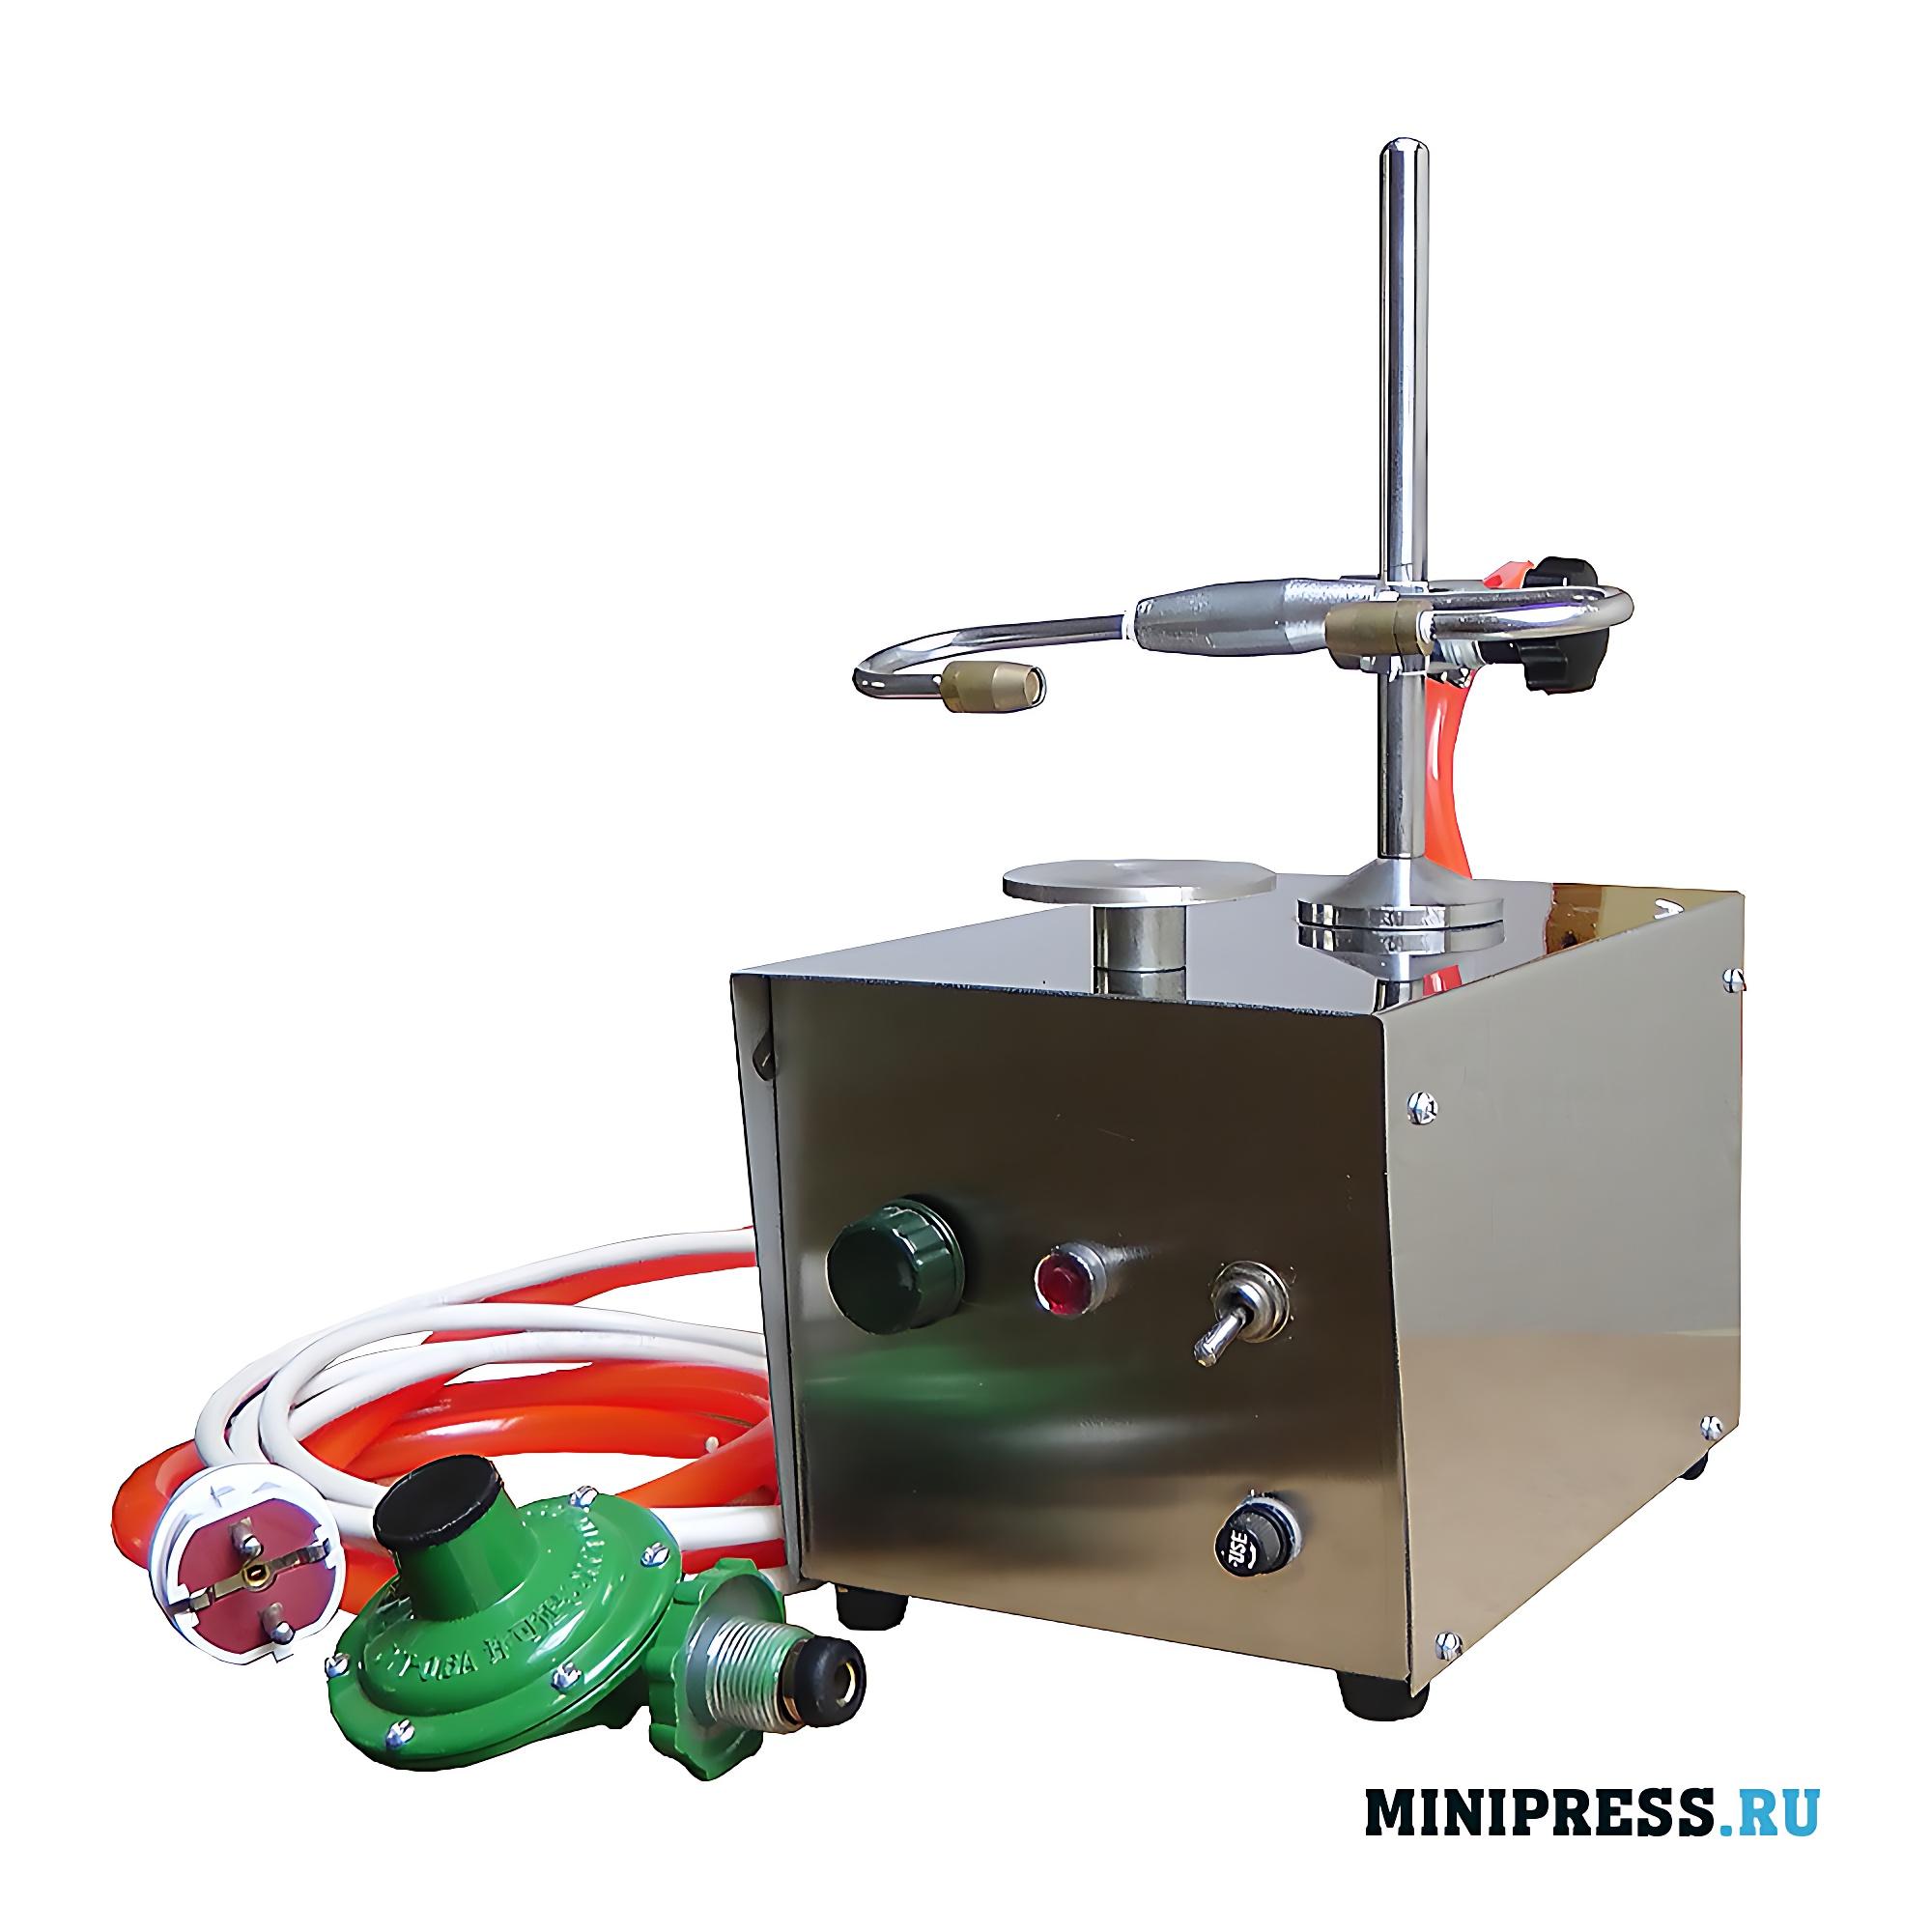 Настольная машинка для запайки ампул для фармацевтического производства